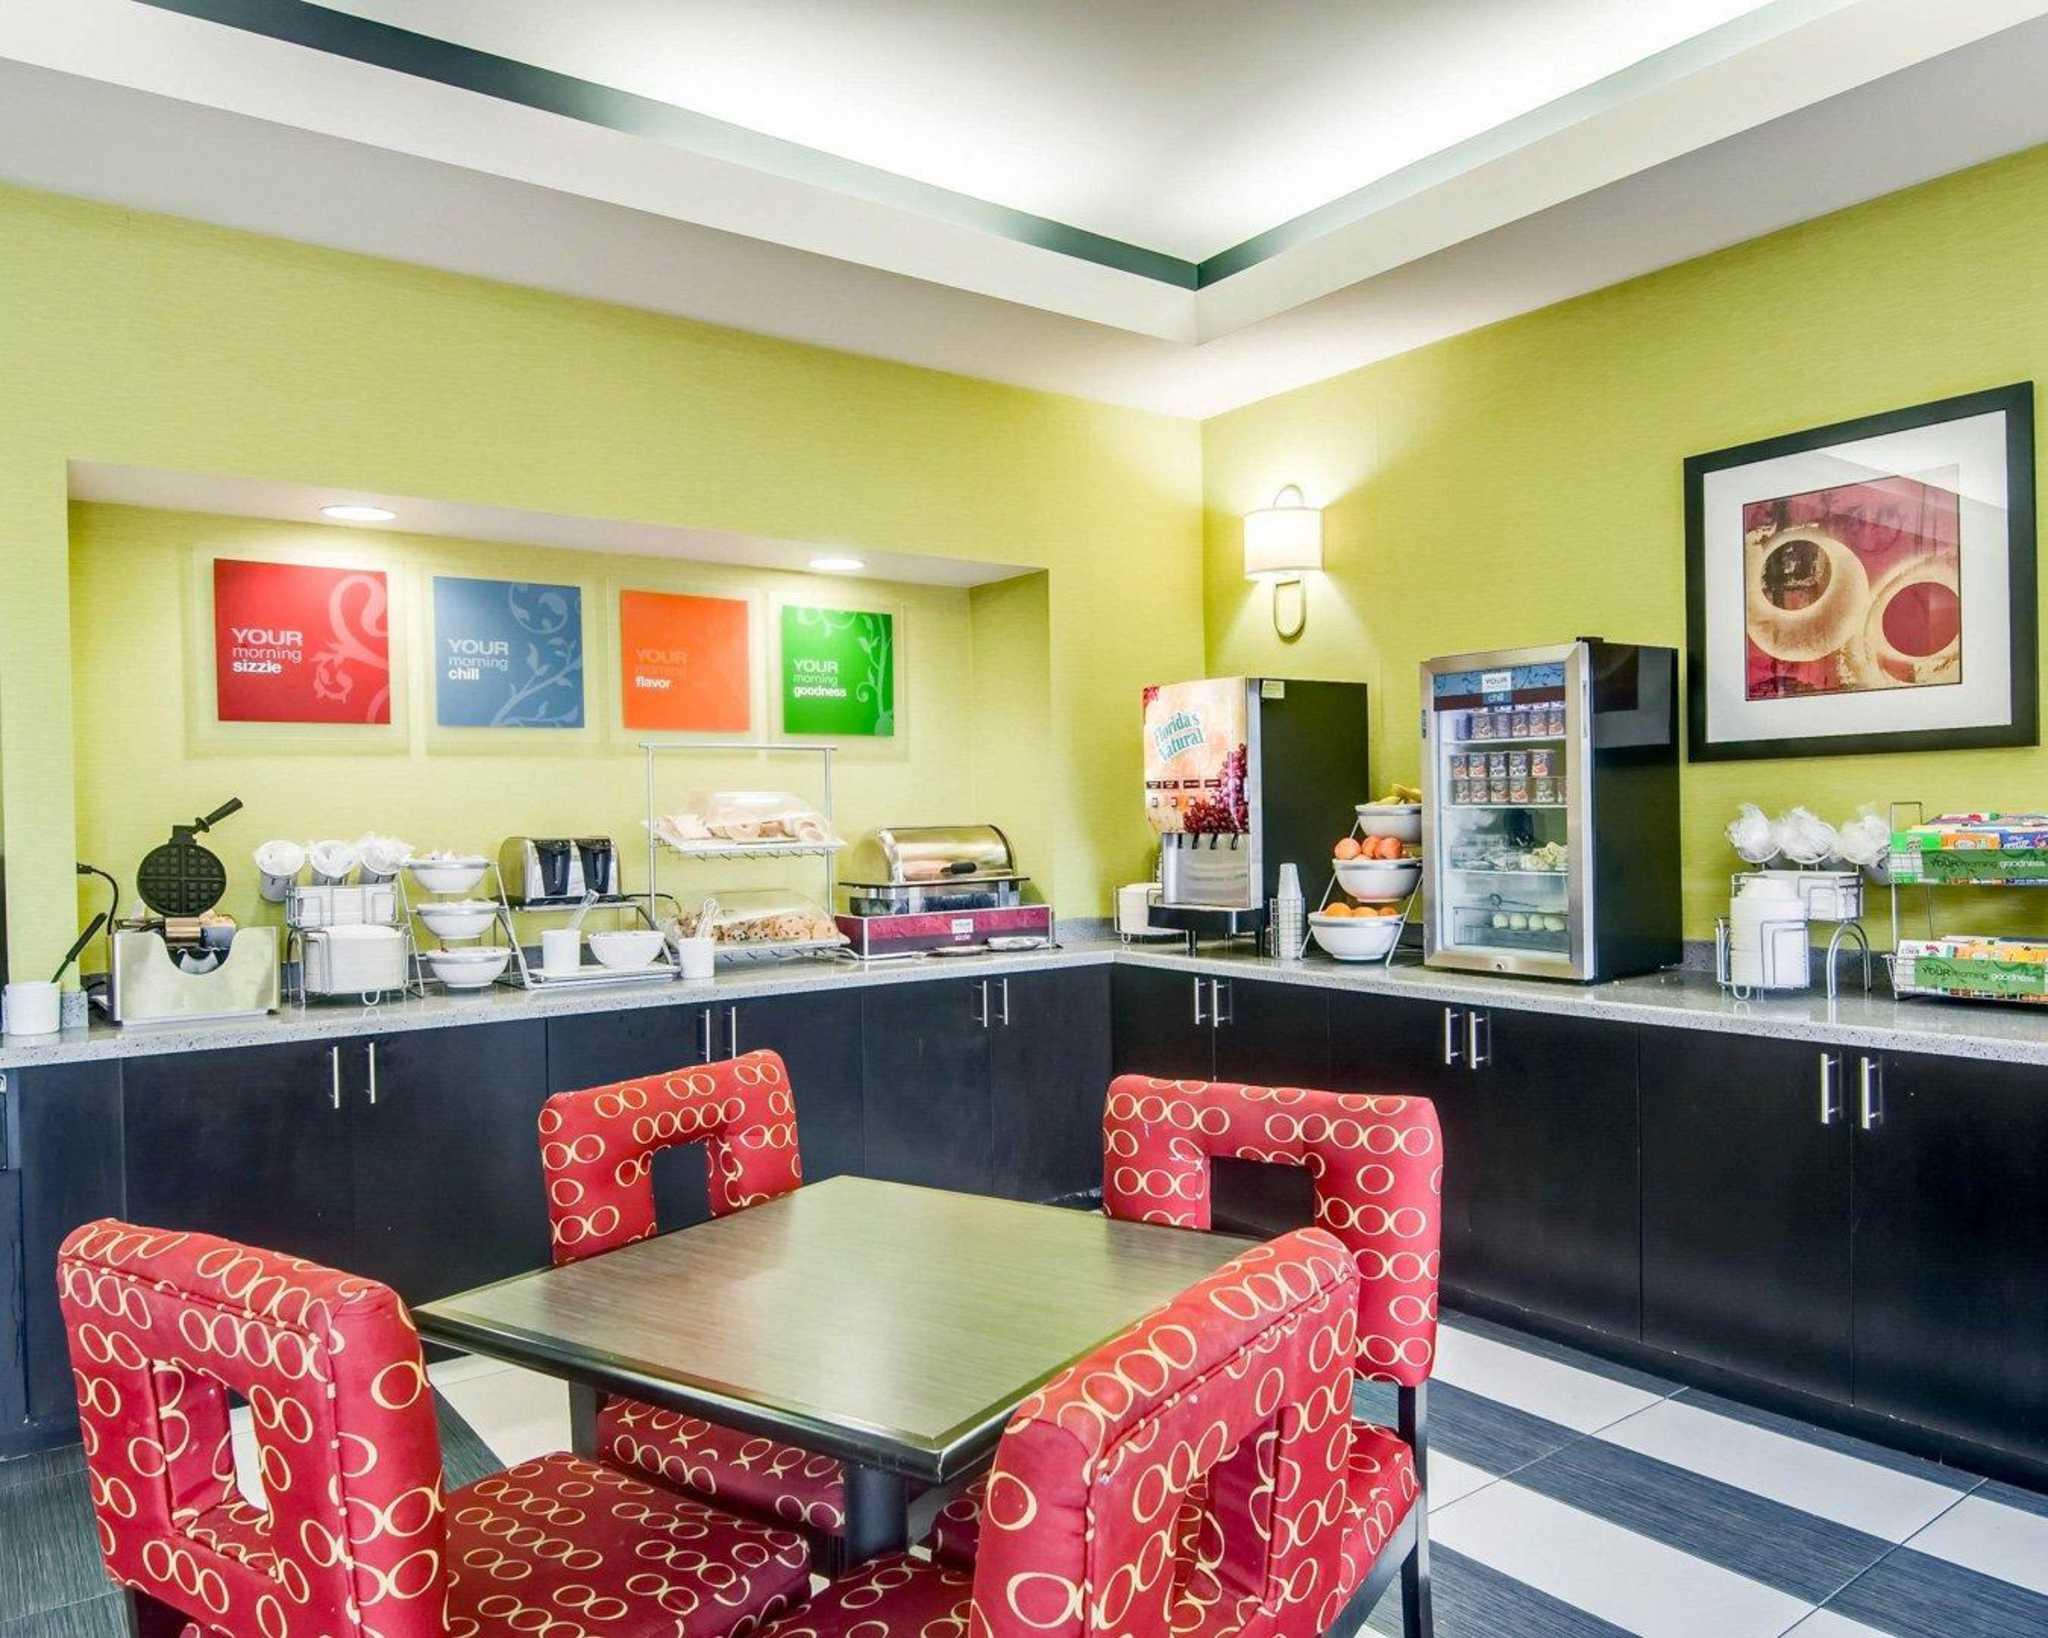 Comfort Suites Inn at Ridgewood Farm image 20